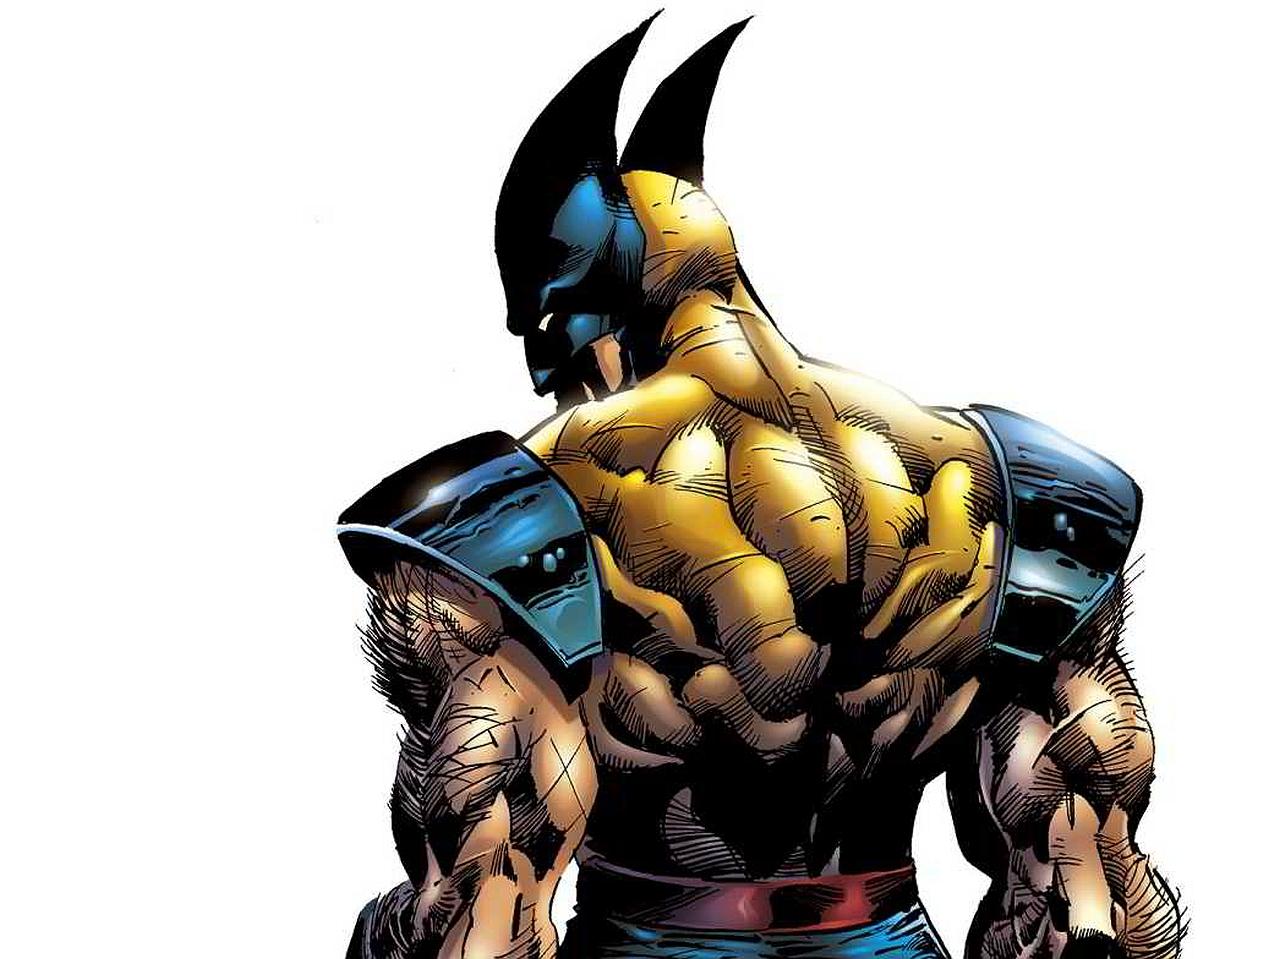 Wolverine X Men Art 1280x959 Wallpaper Teahub Io